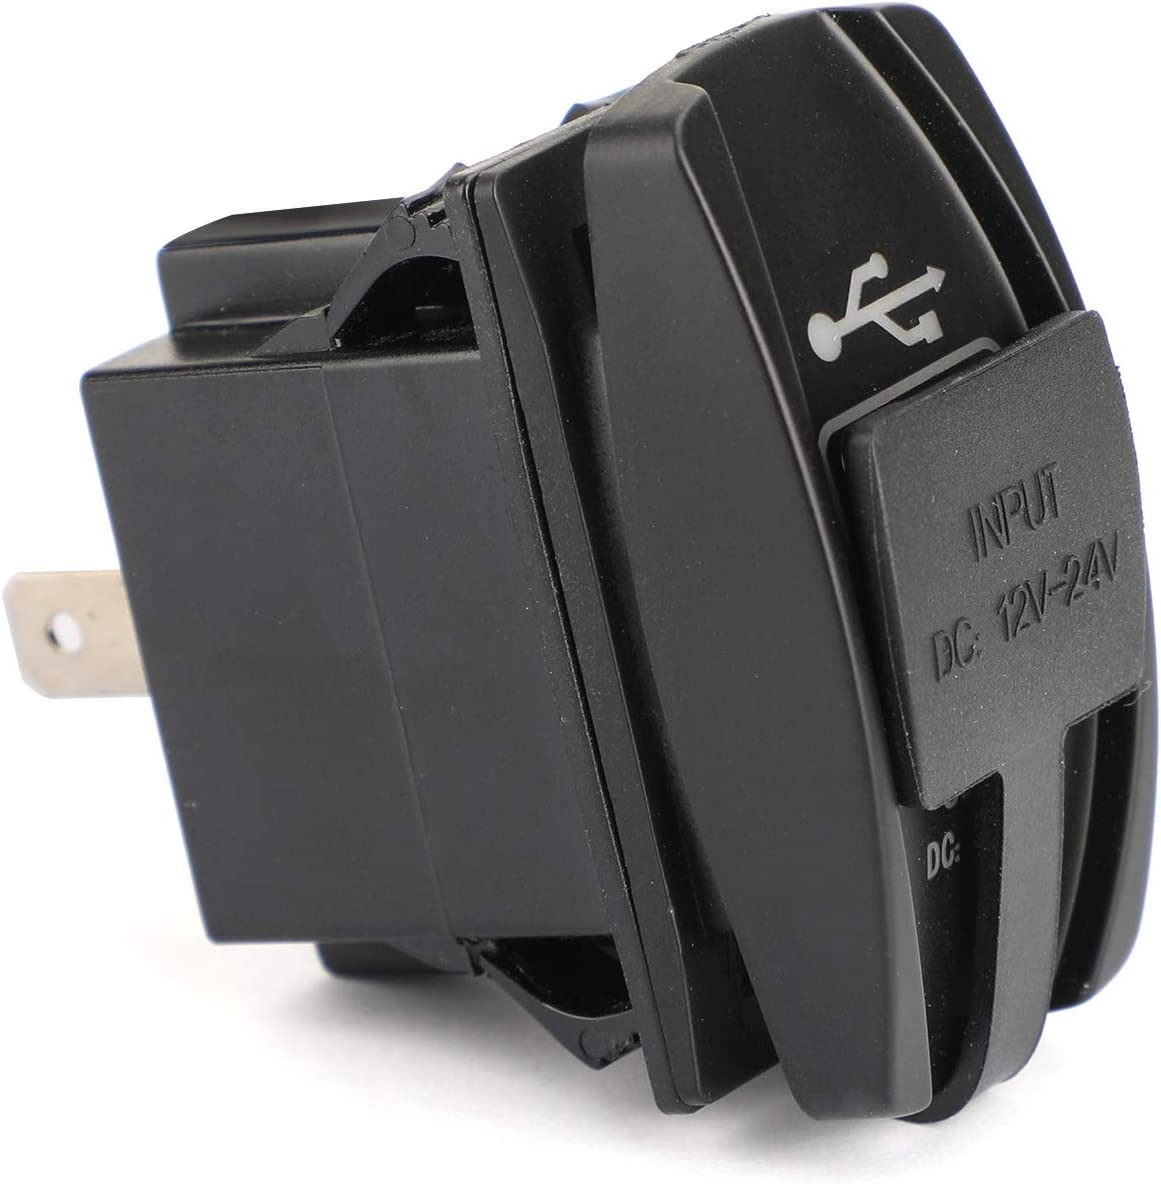 CHENDGE2 Dual USB Socket Charger for UTV Can Am Polaris RZR Ranger 900 1000 XP 750 Red